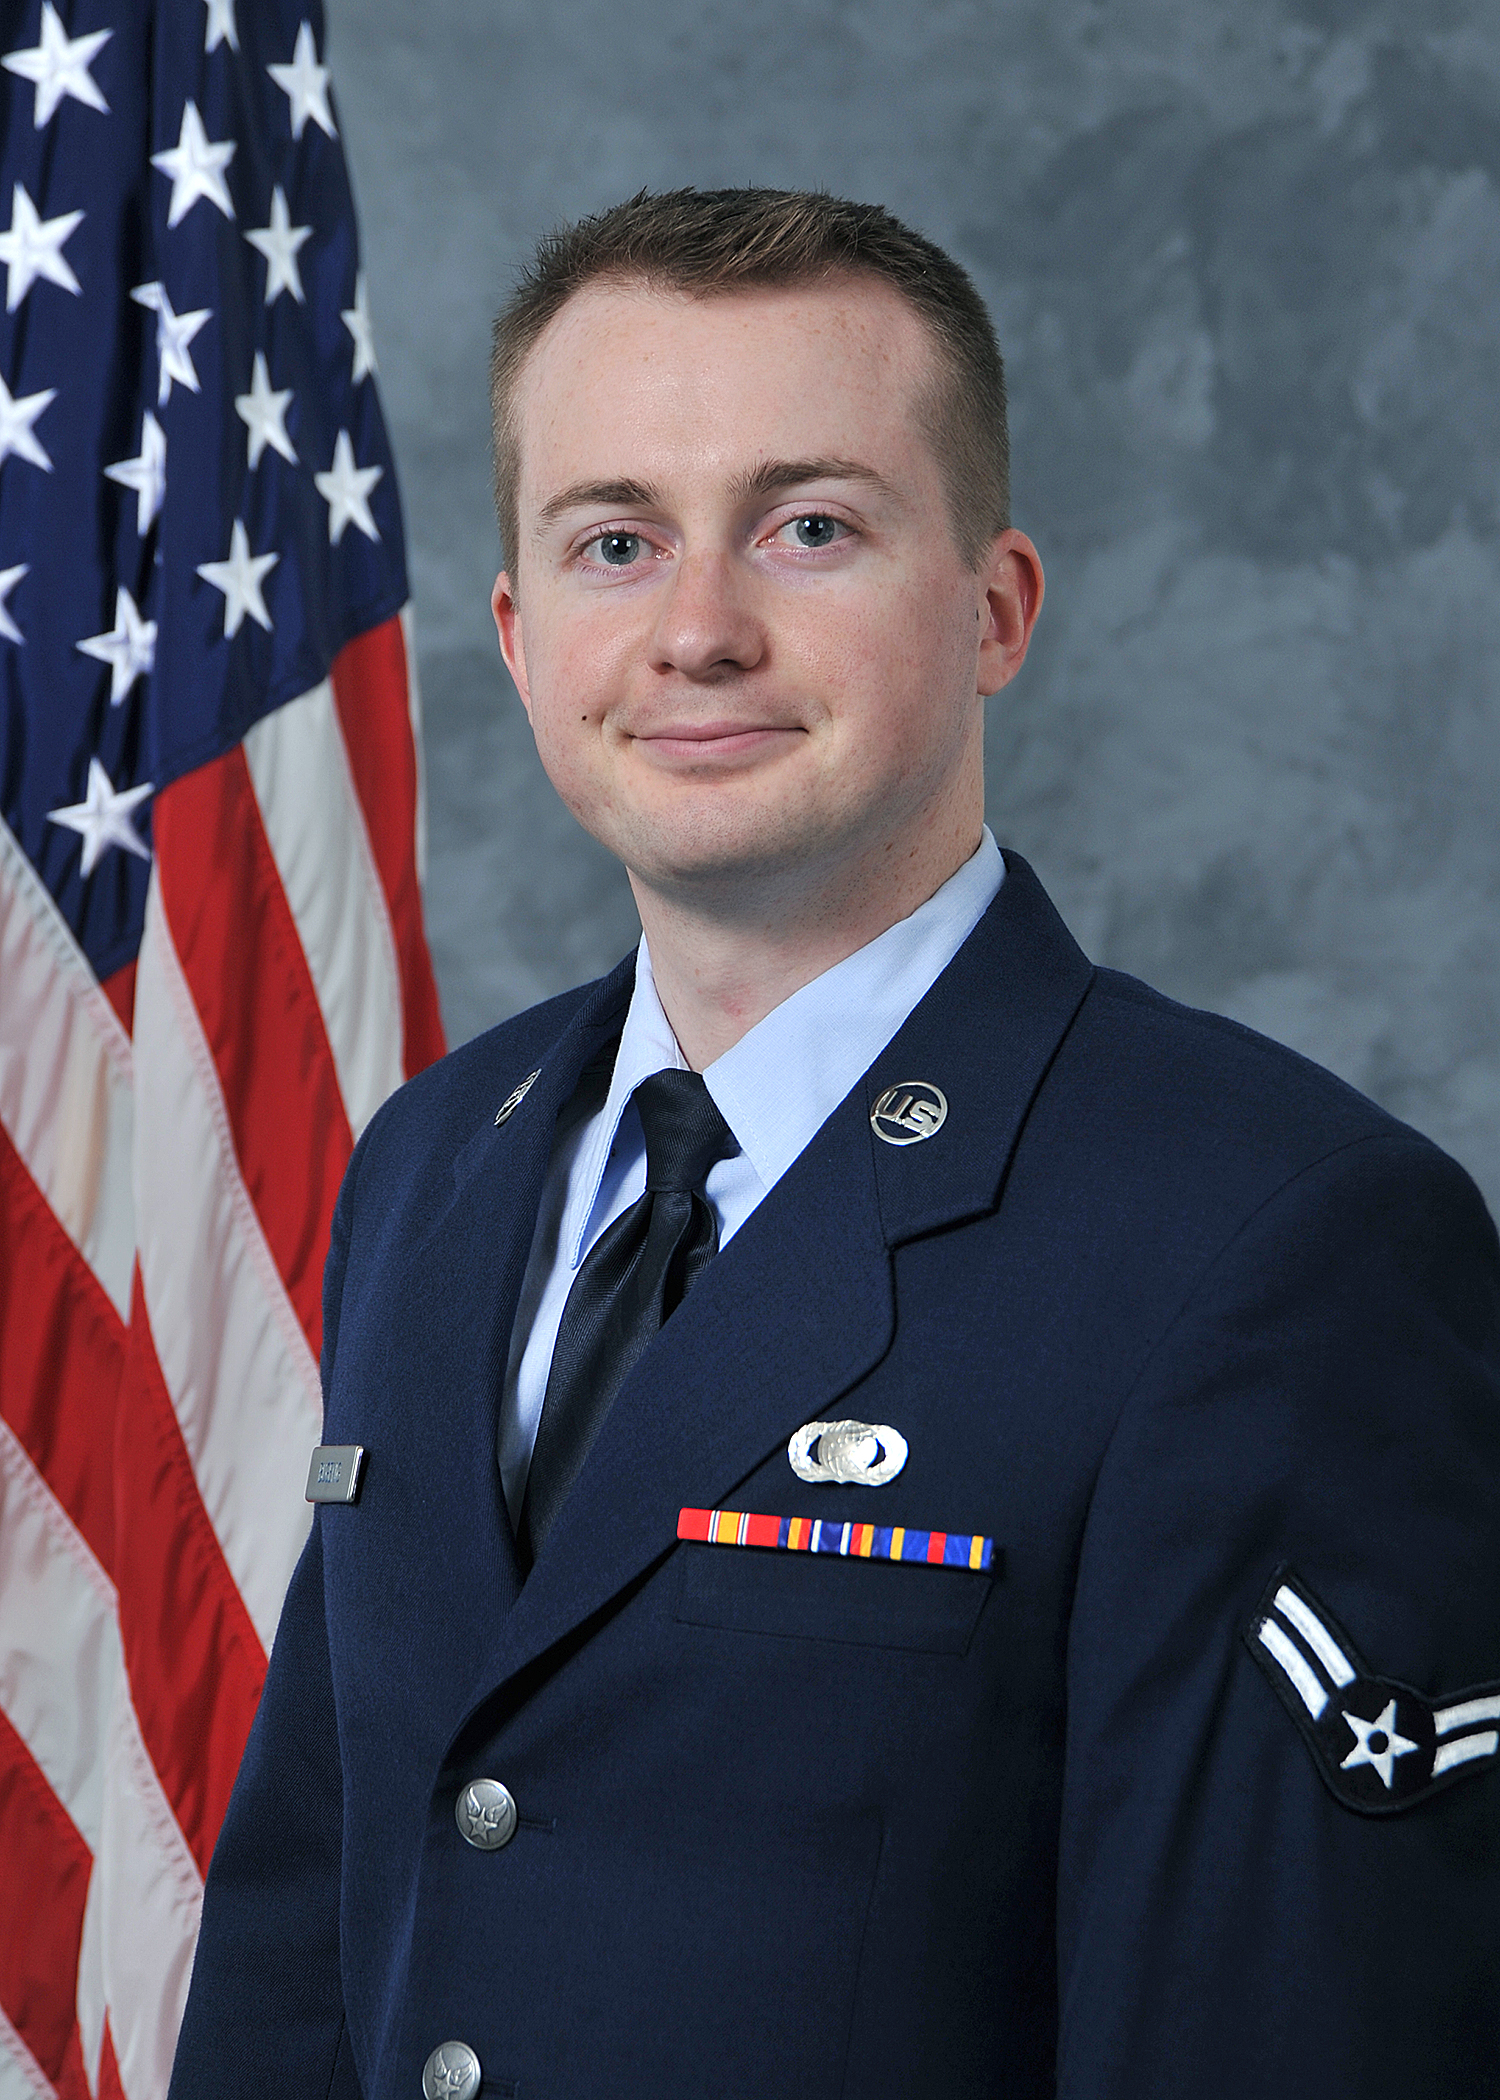 Us air force dress uniform rank placement